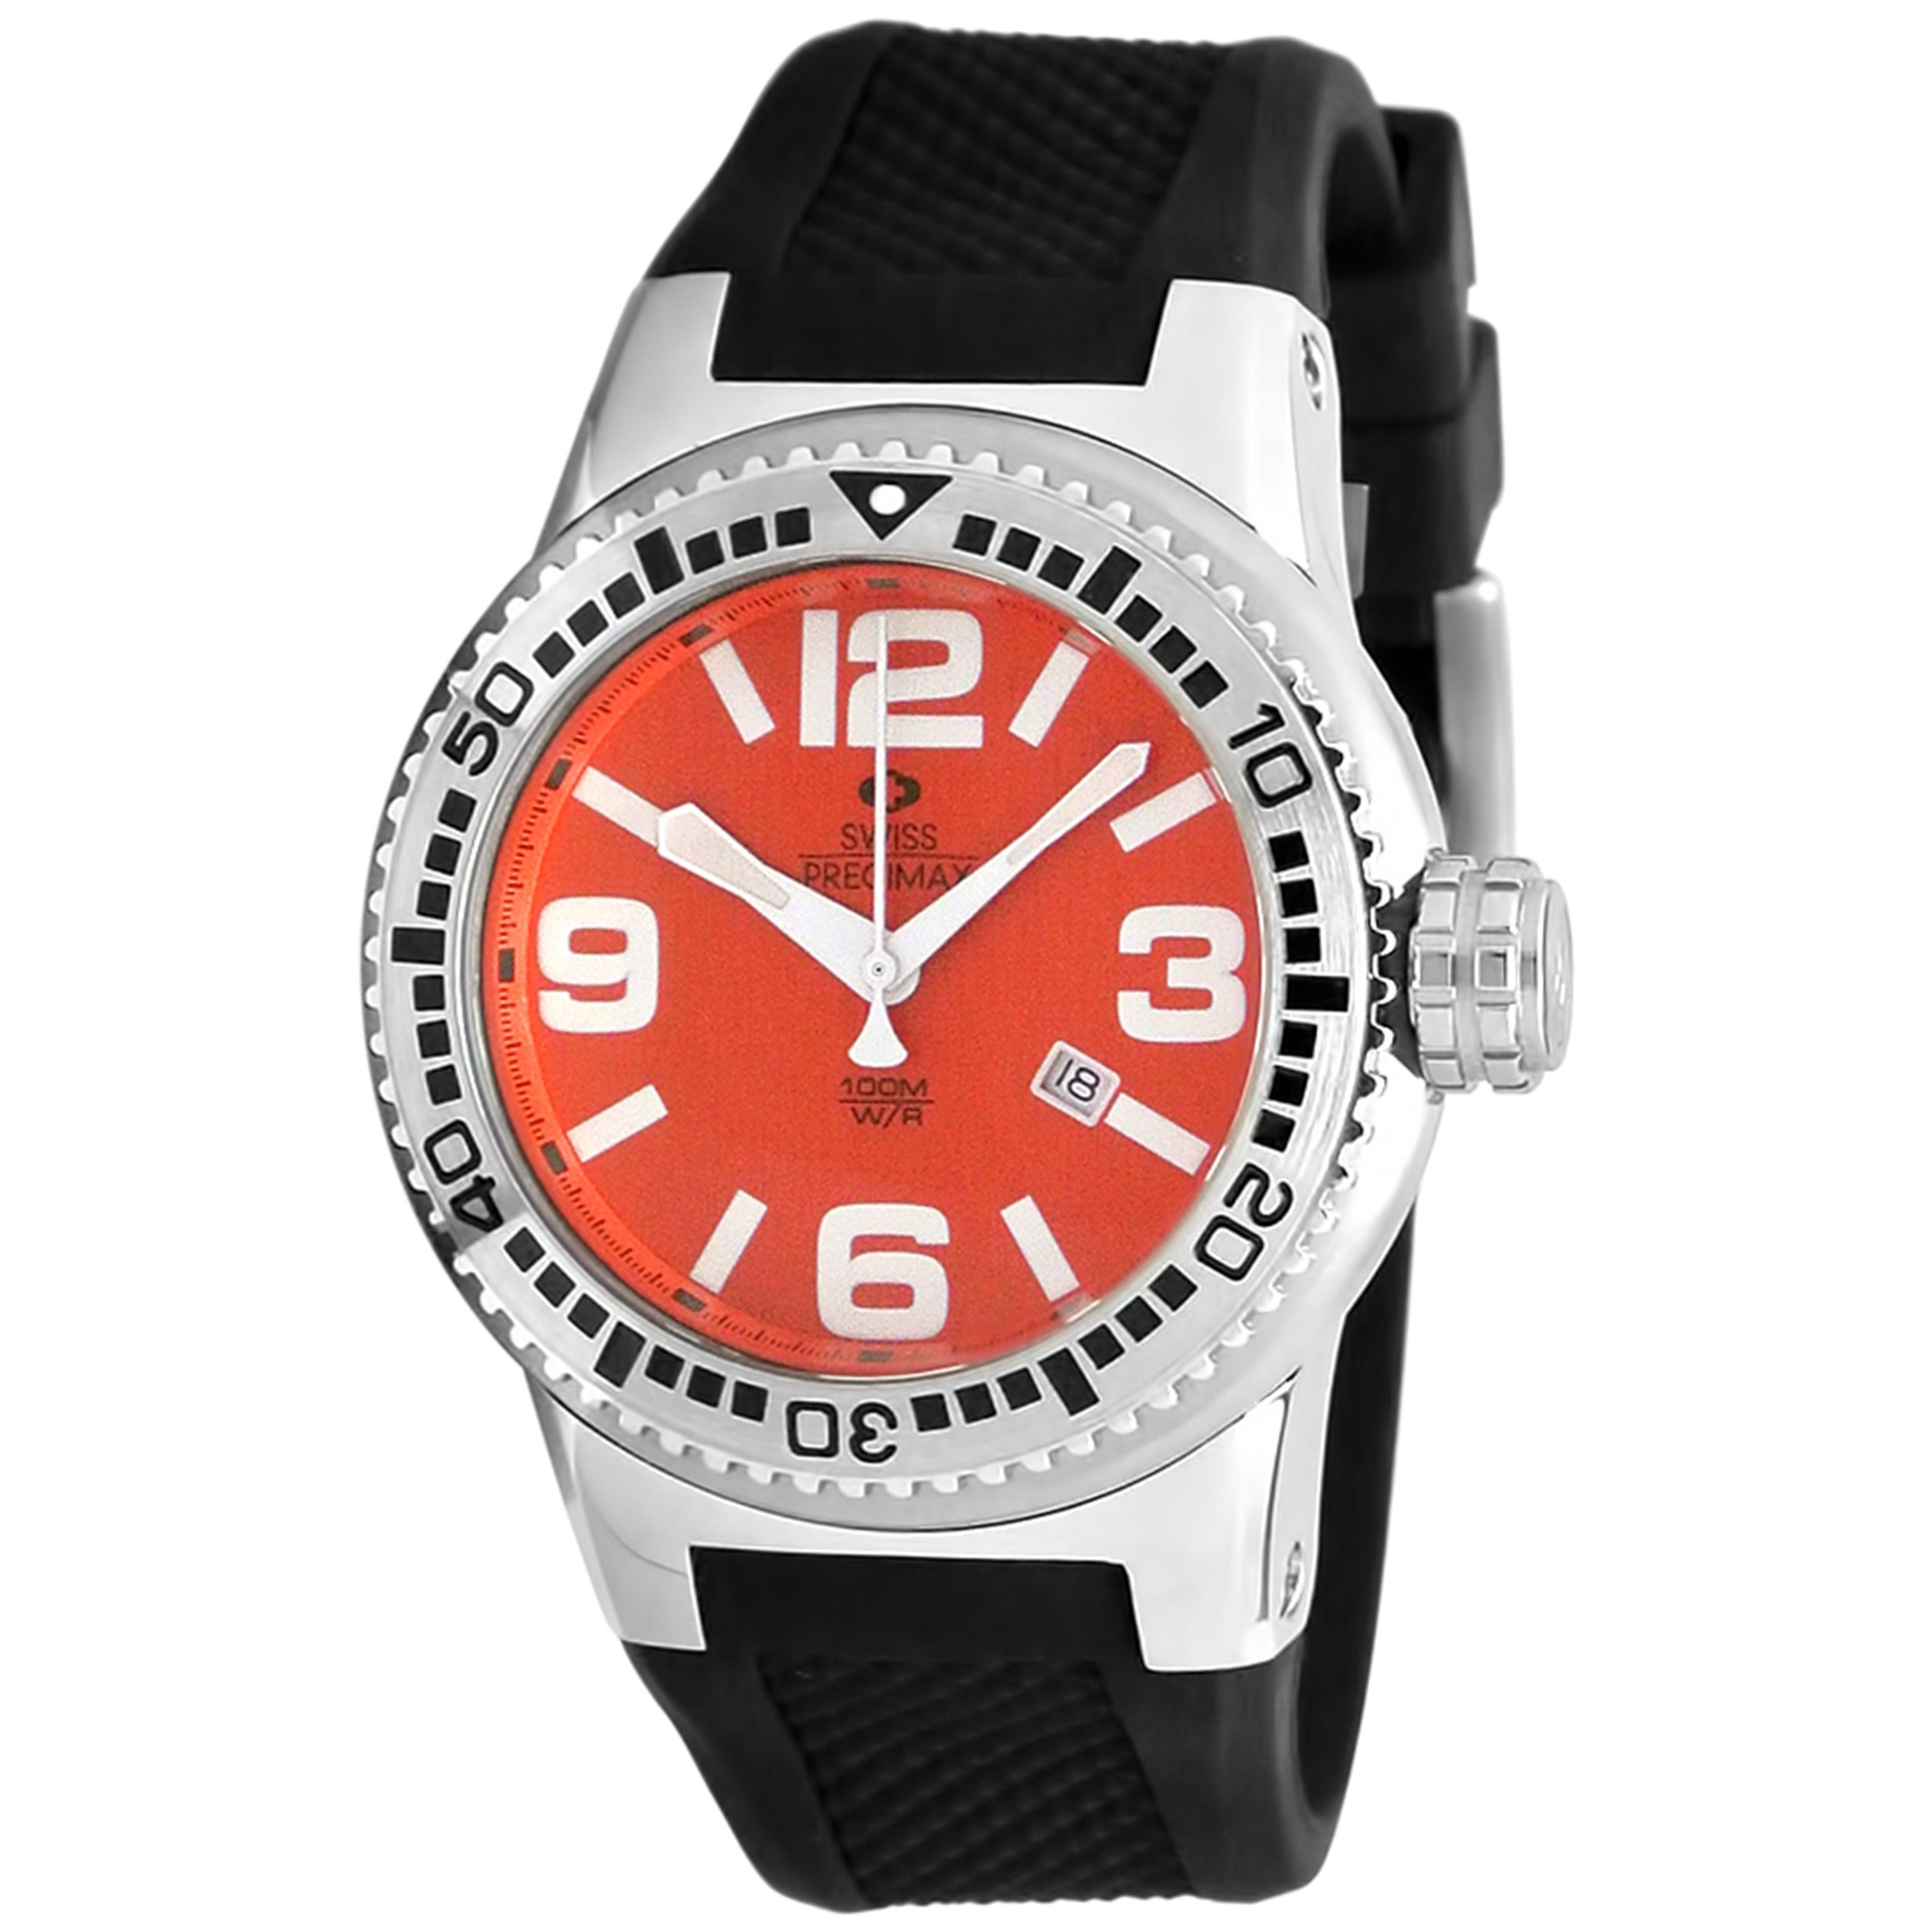 Swiss Precimax Men's Titan Red Dial Watch